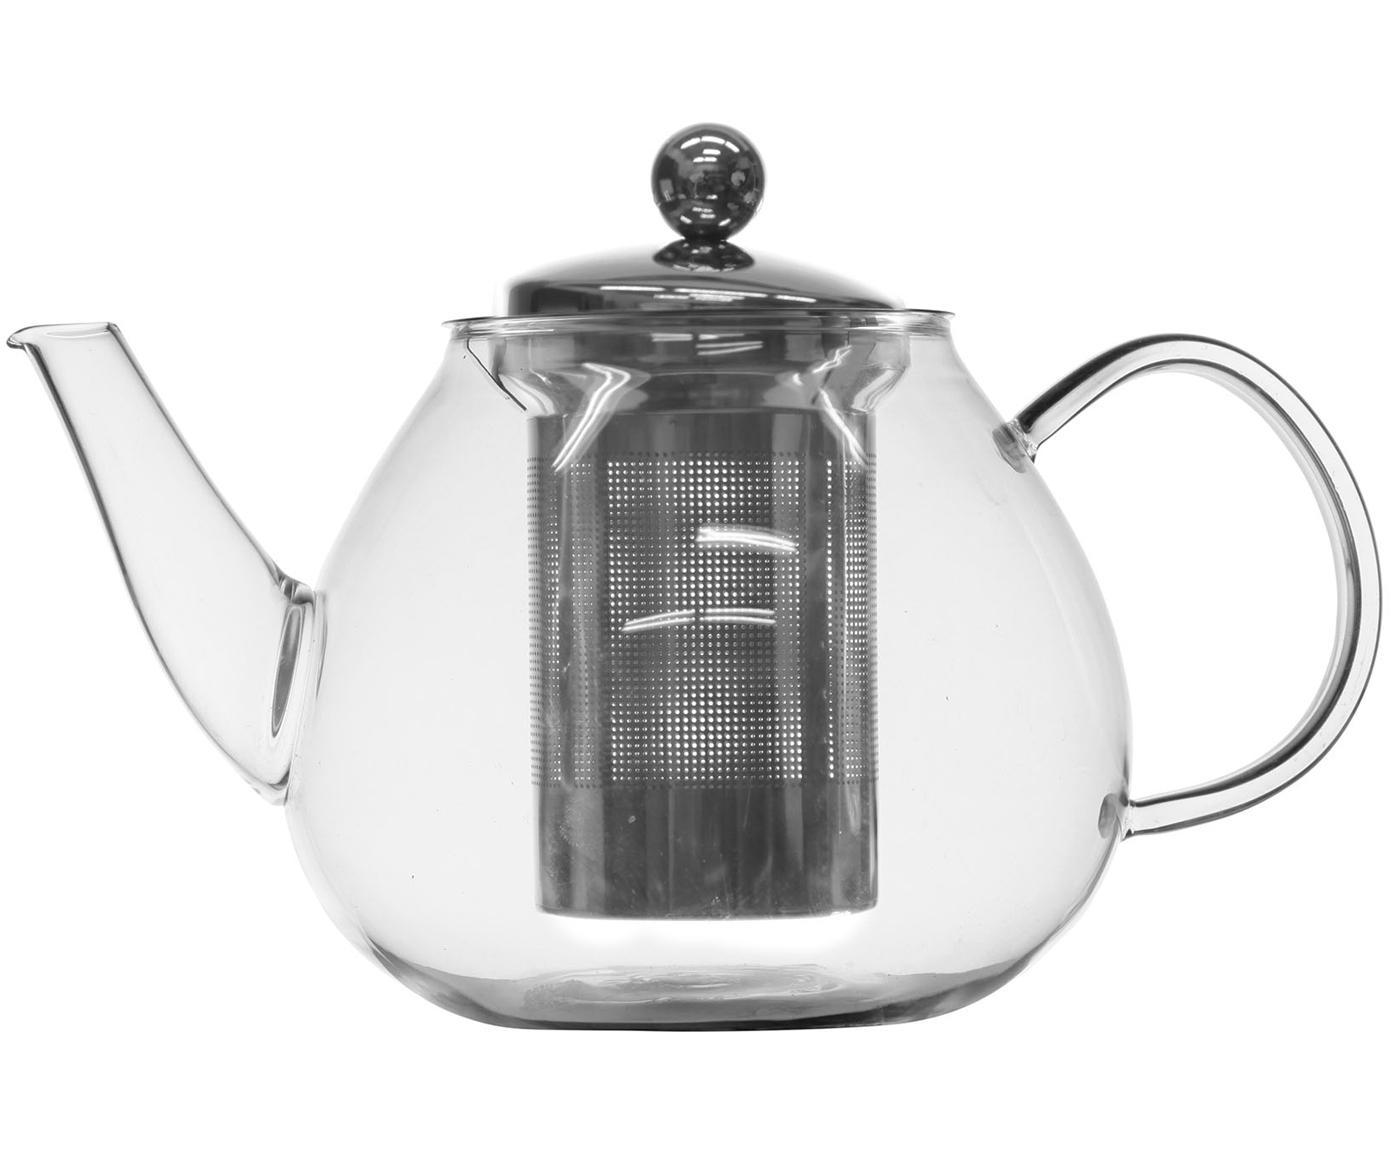 Tetera Archie, Tetera: vidrio, Transparente, plateado, 1 L